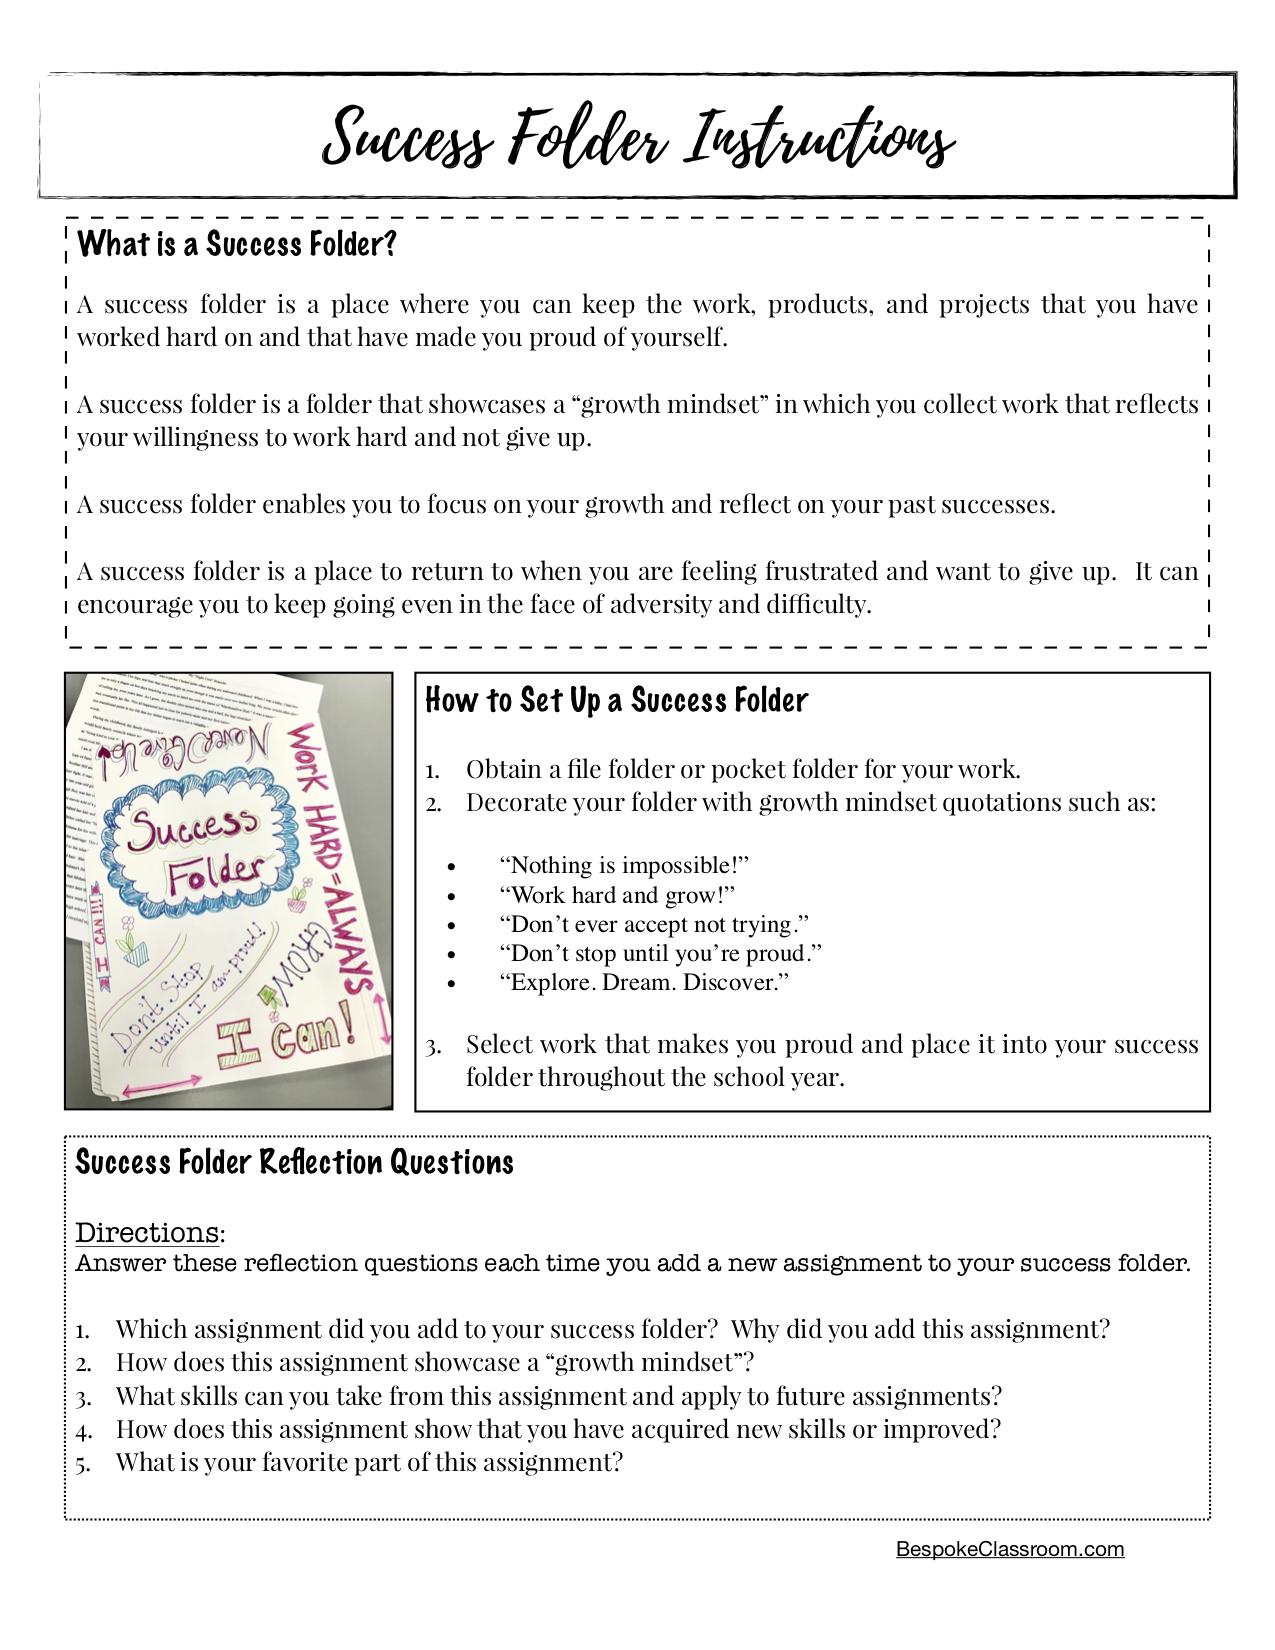 Success Folder Instructions by Bespoke ELA2.jpg